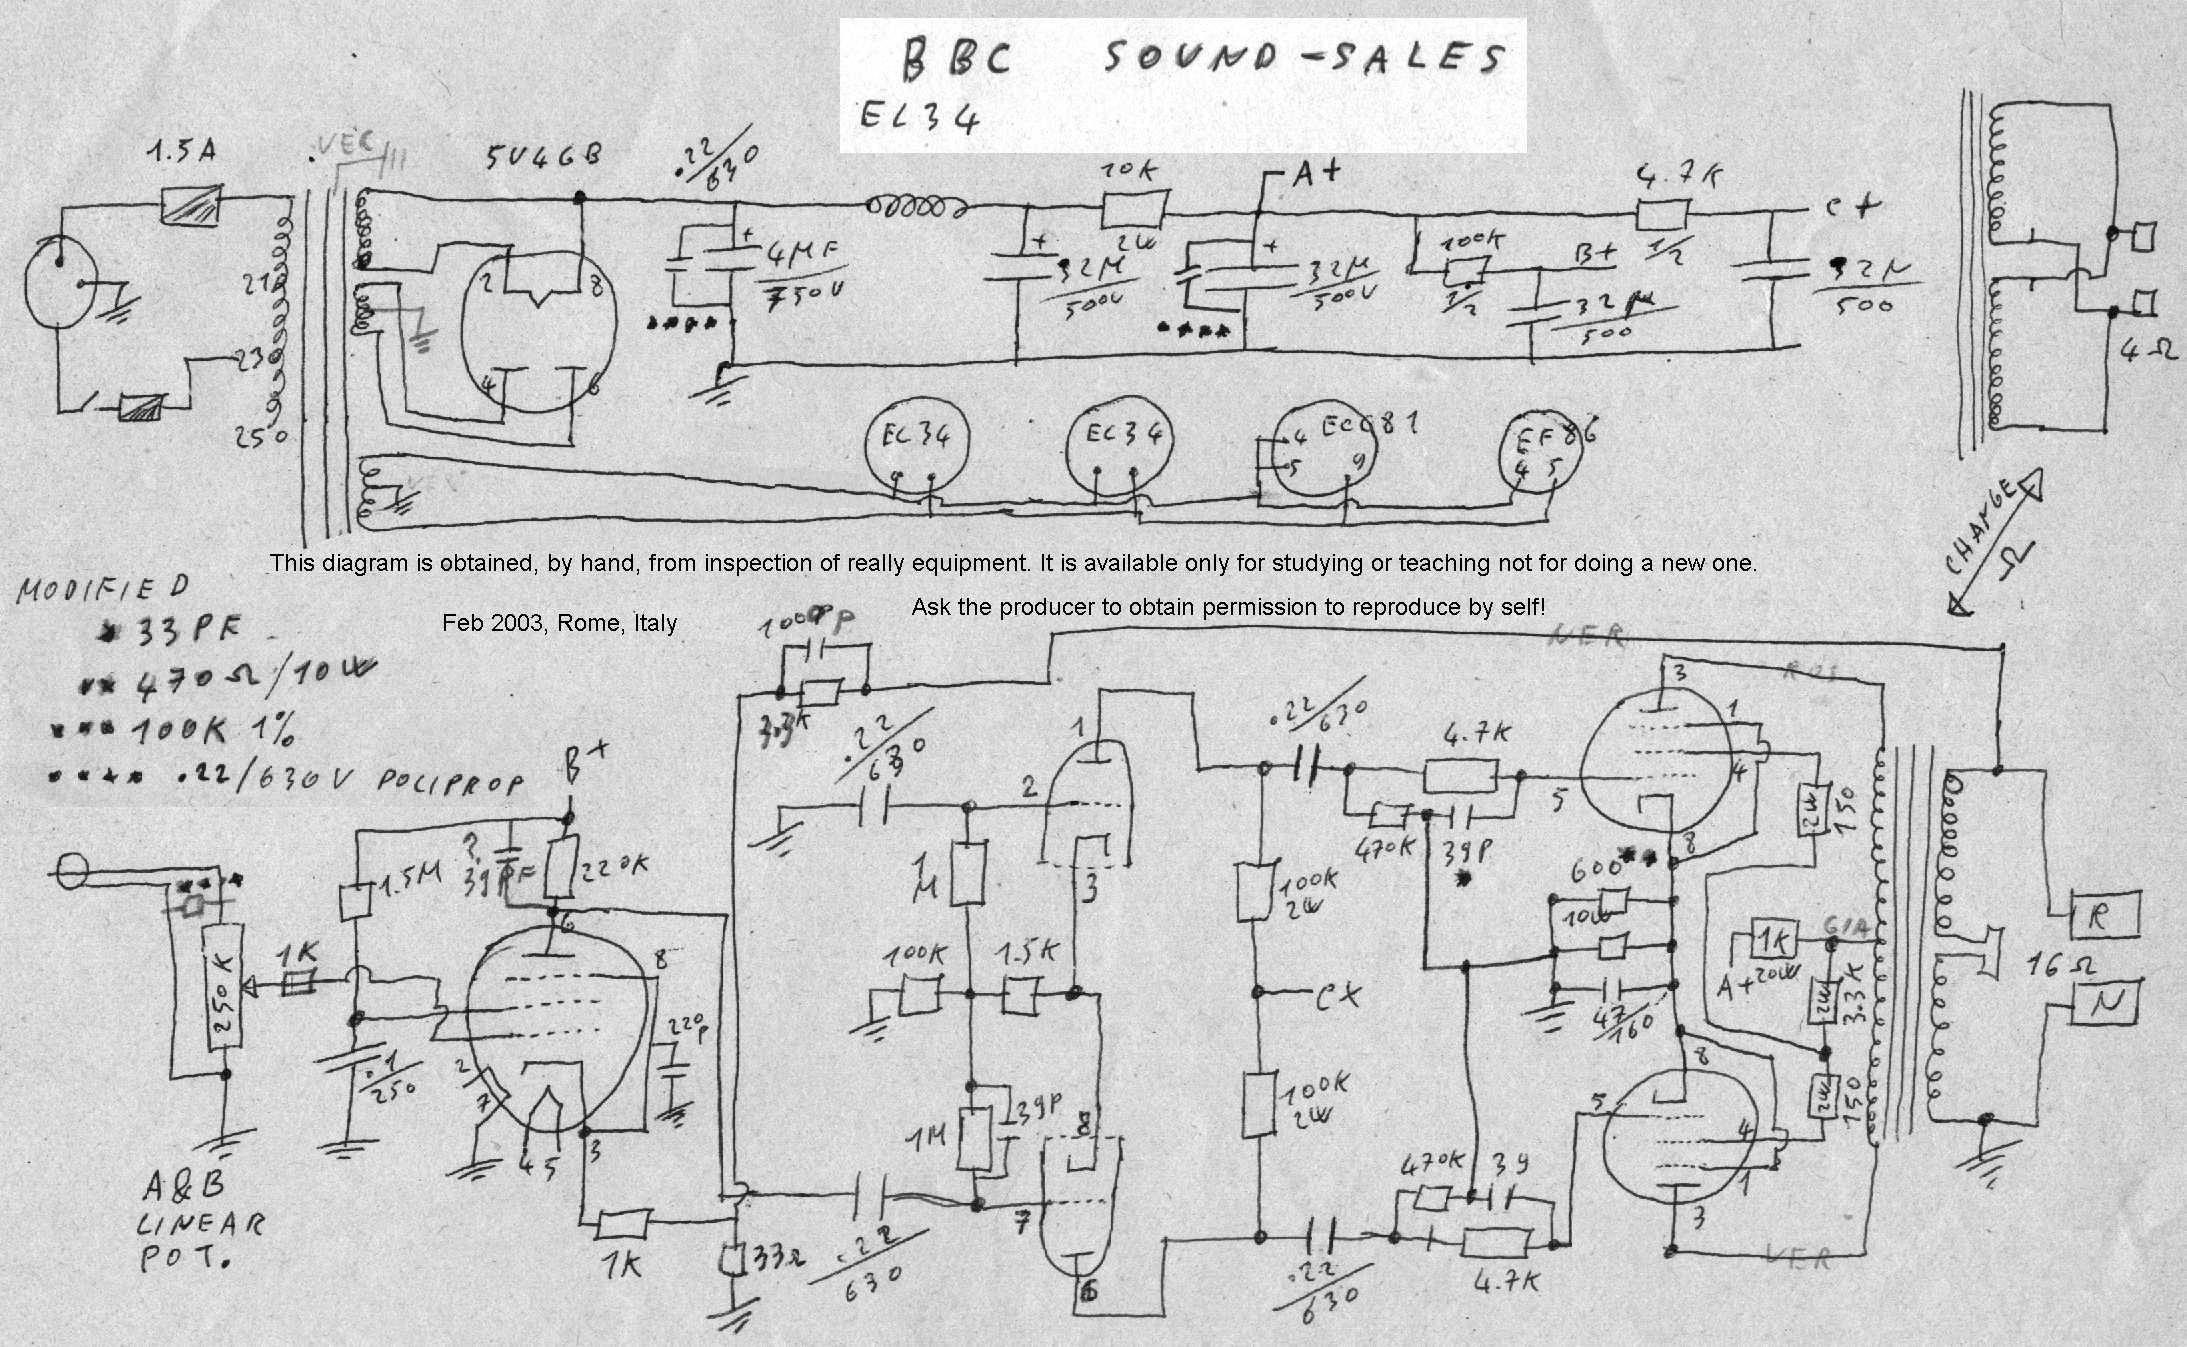 Schemi Elettrici Hi Fi : Dr. g. visco; official home page; hifi tubes rebuild bbc sound sales